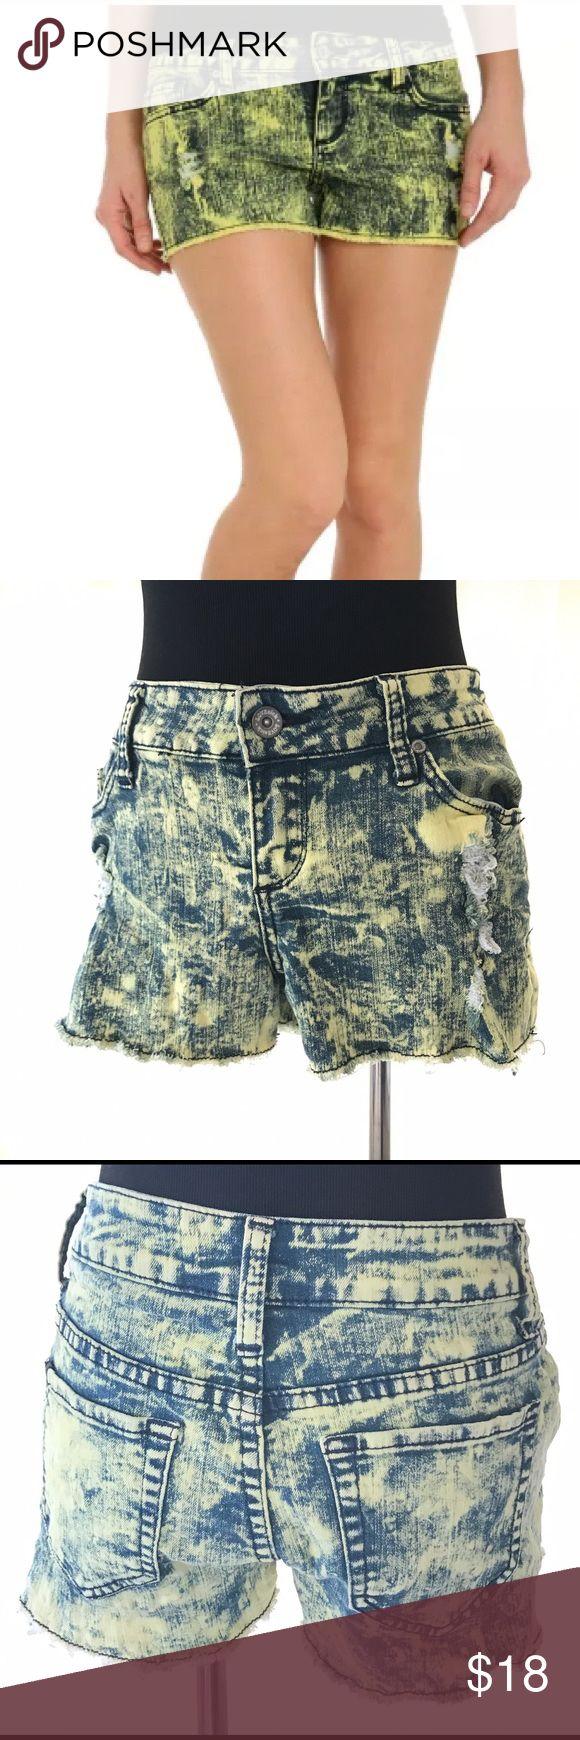 HOT TOPIC LOVESICK YELLOW ACID WASH SHORTS SIZE 7 Gorgeous great condition yellow acid wash shorts from hot topic. SiE 7 Hot Topic Shorts Jean Shorts